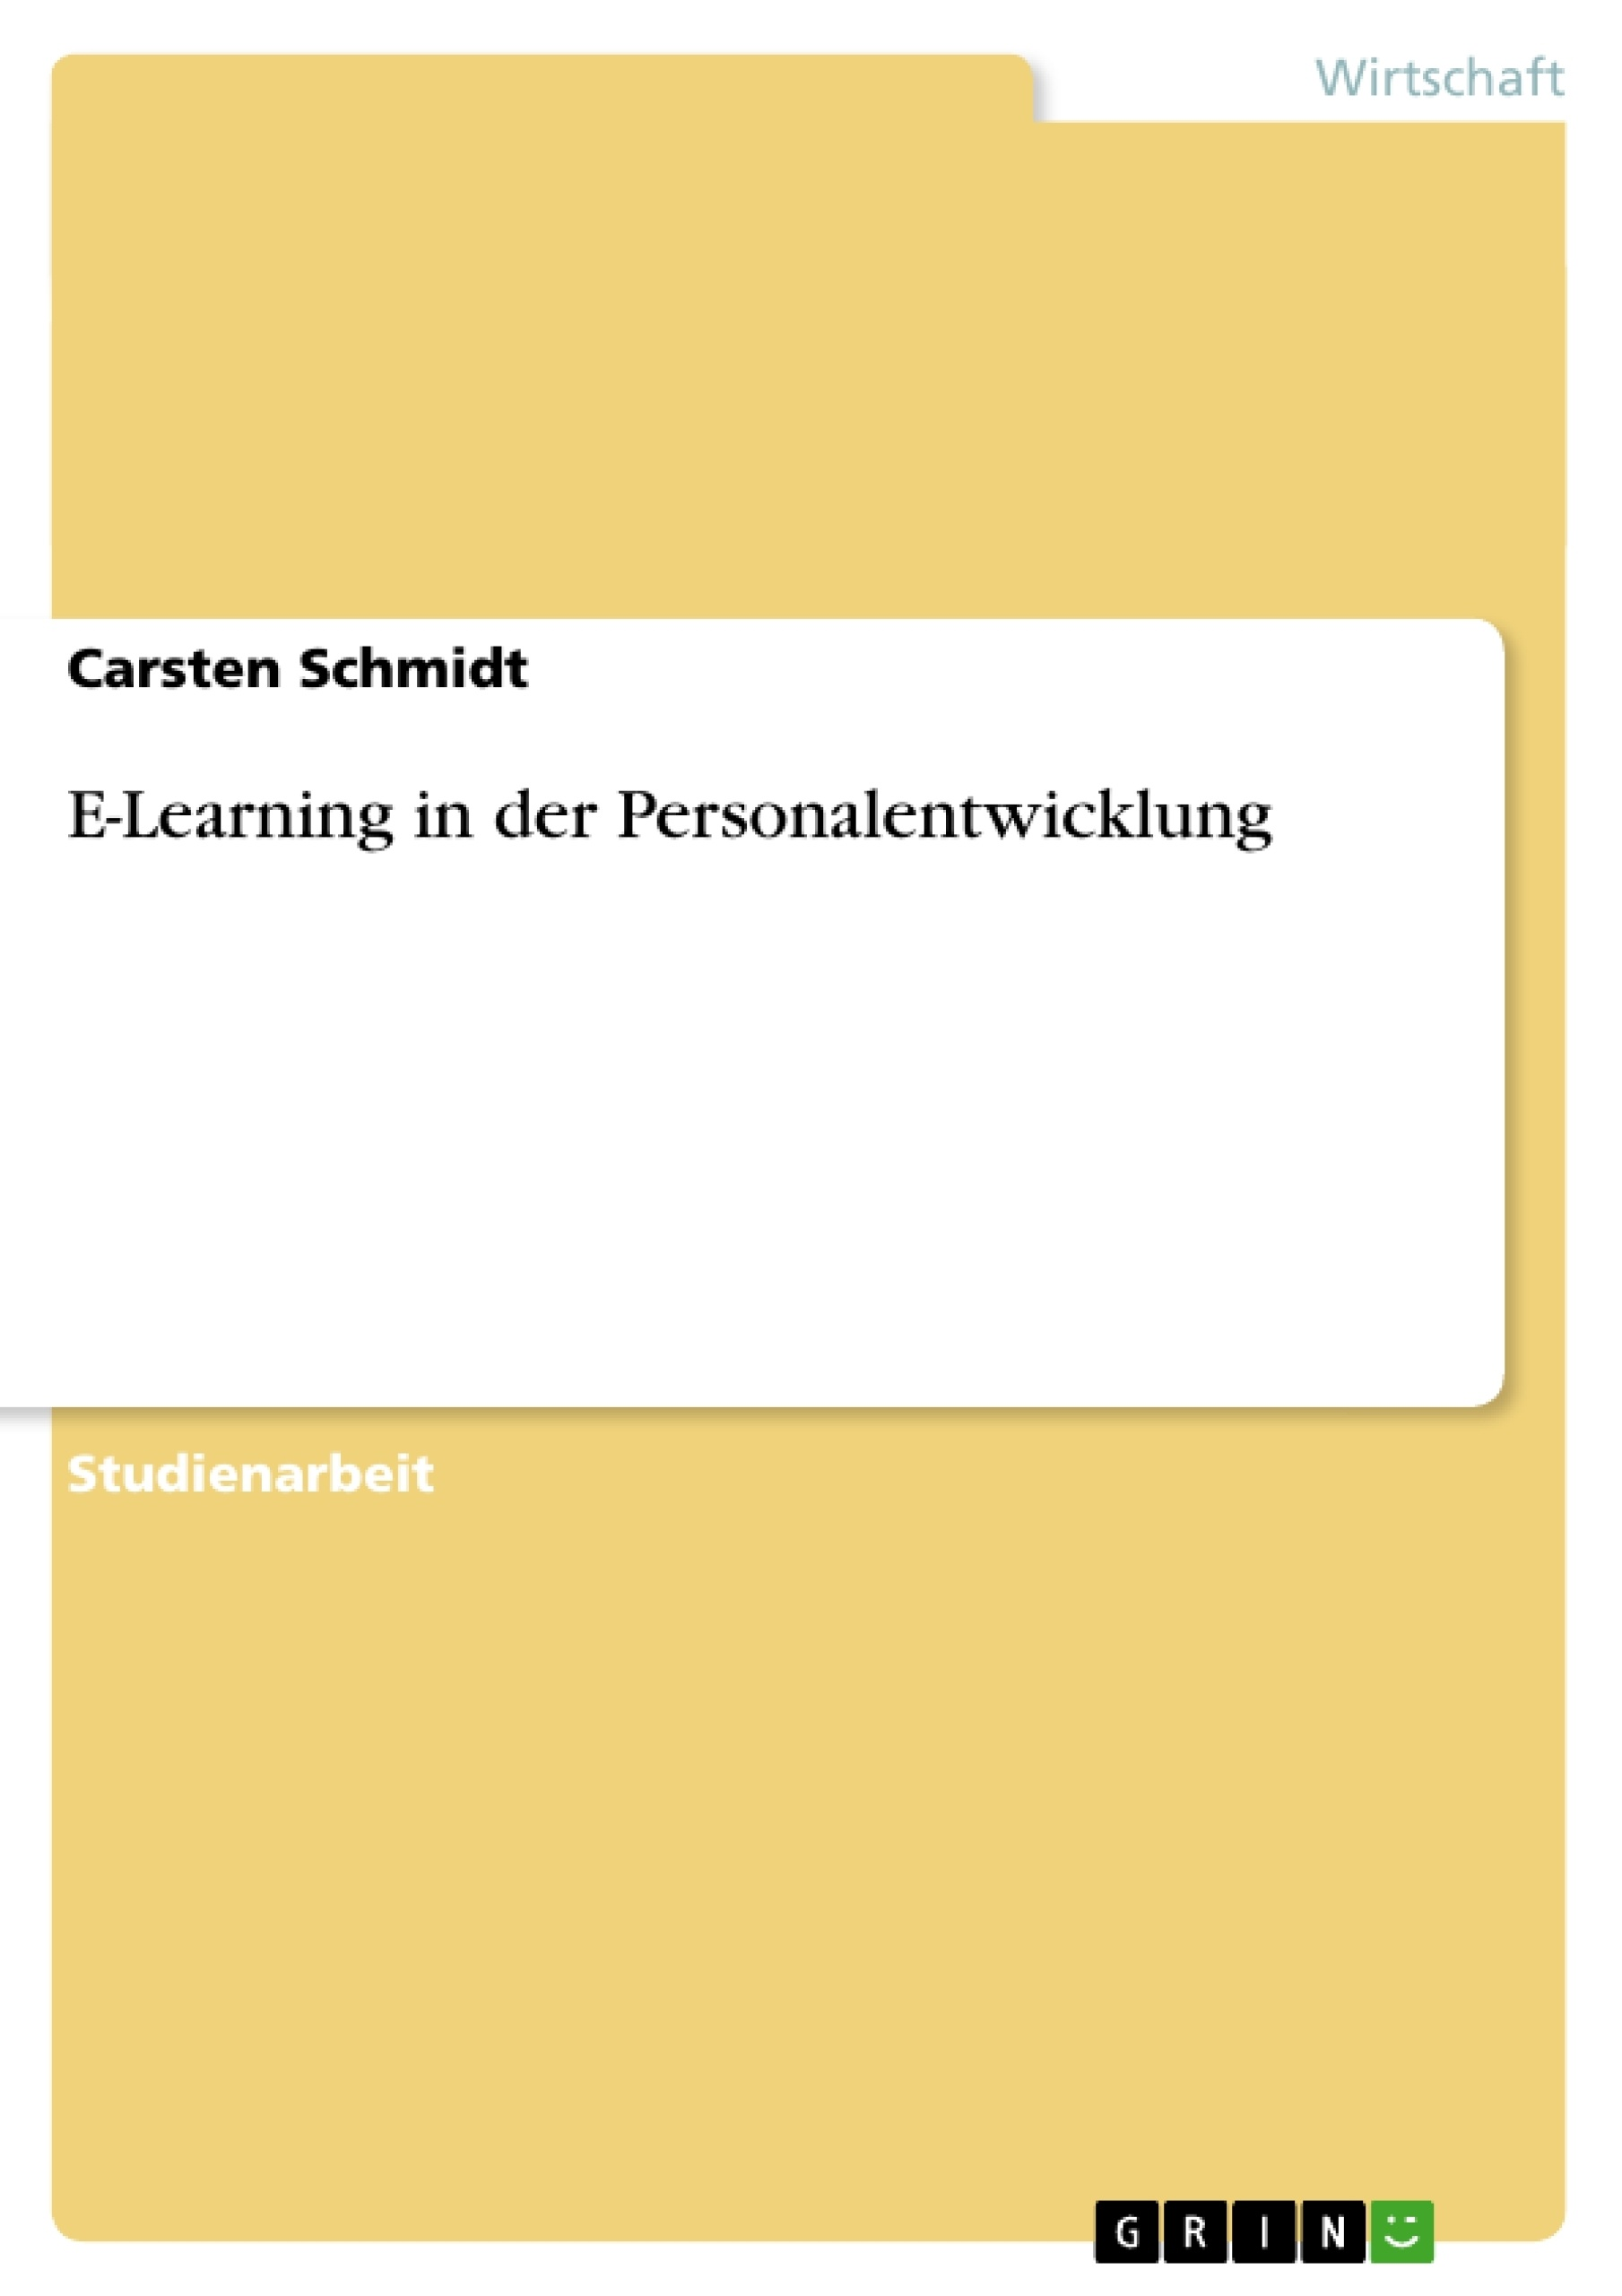 Titel: E-Learning in der Personalentwicklung